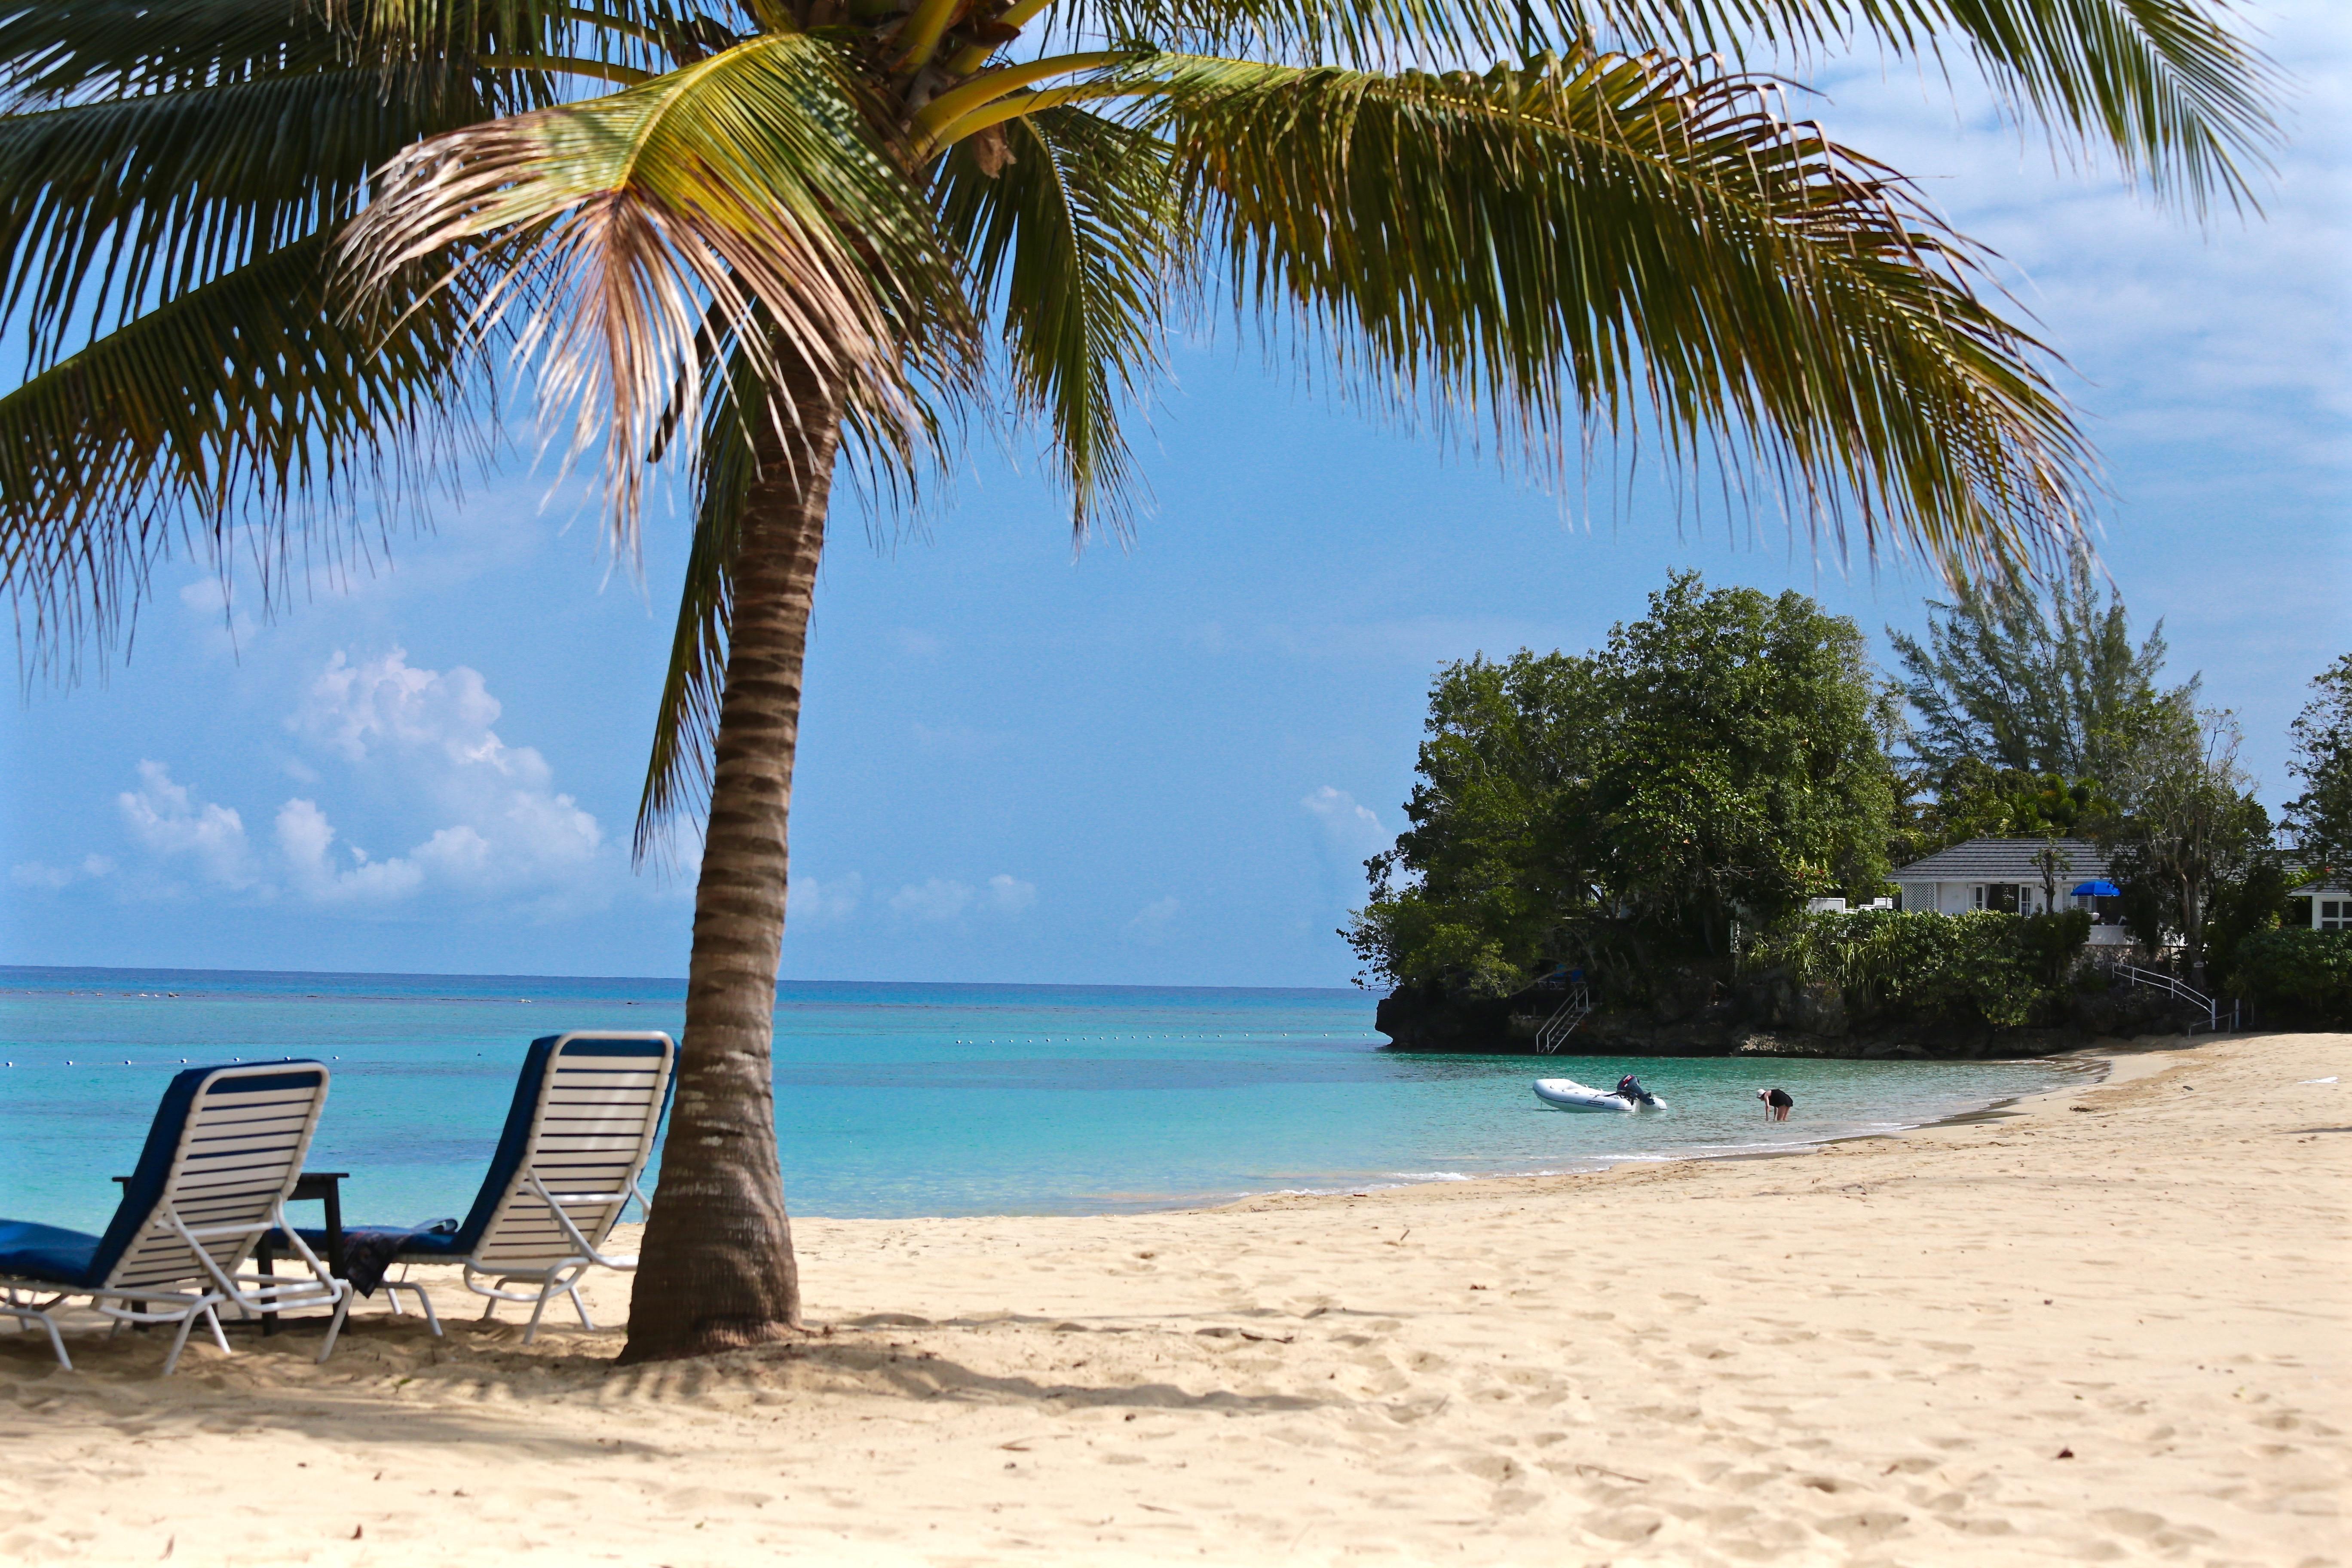 Wallpaper Sea Bay Shore Sand Sky Shadow Clouds Beach Tourism Blue Coast Resort Island Lagoon Caribbean Vacation Jamaica Leisure Ocean